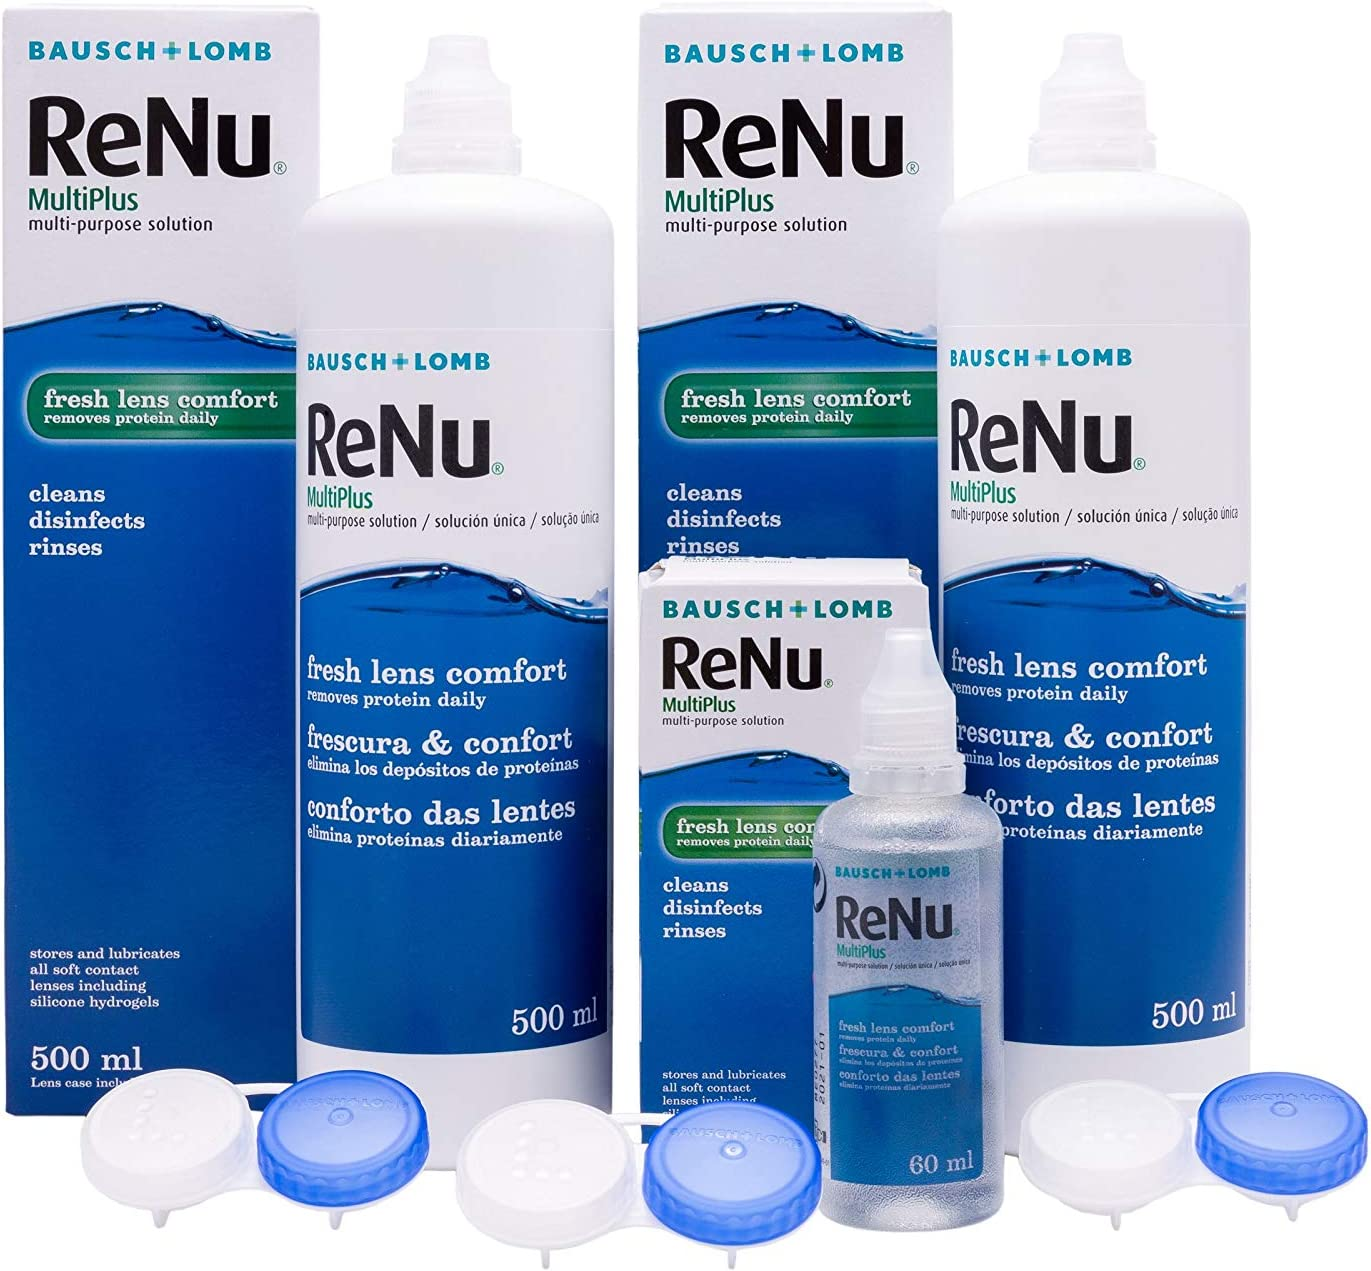 BAUSCH + LOMB - Renu® MultiPlus Solución Única - Pack 2 botellas x 500 ml y 60 ml de regalo